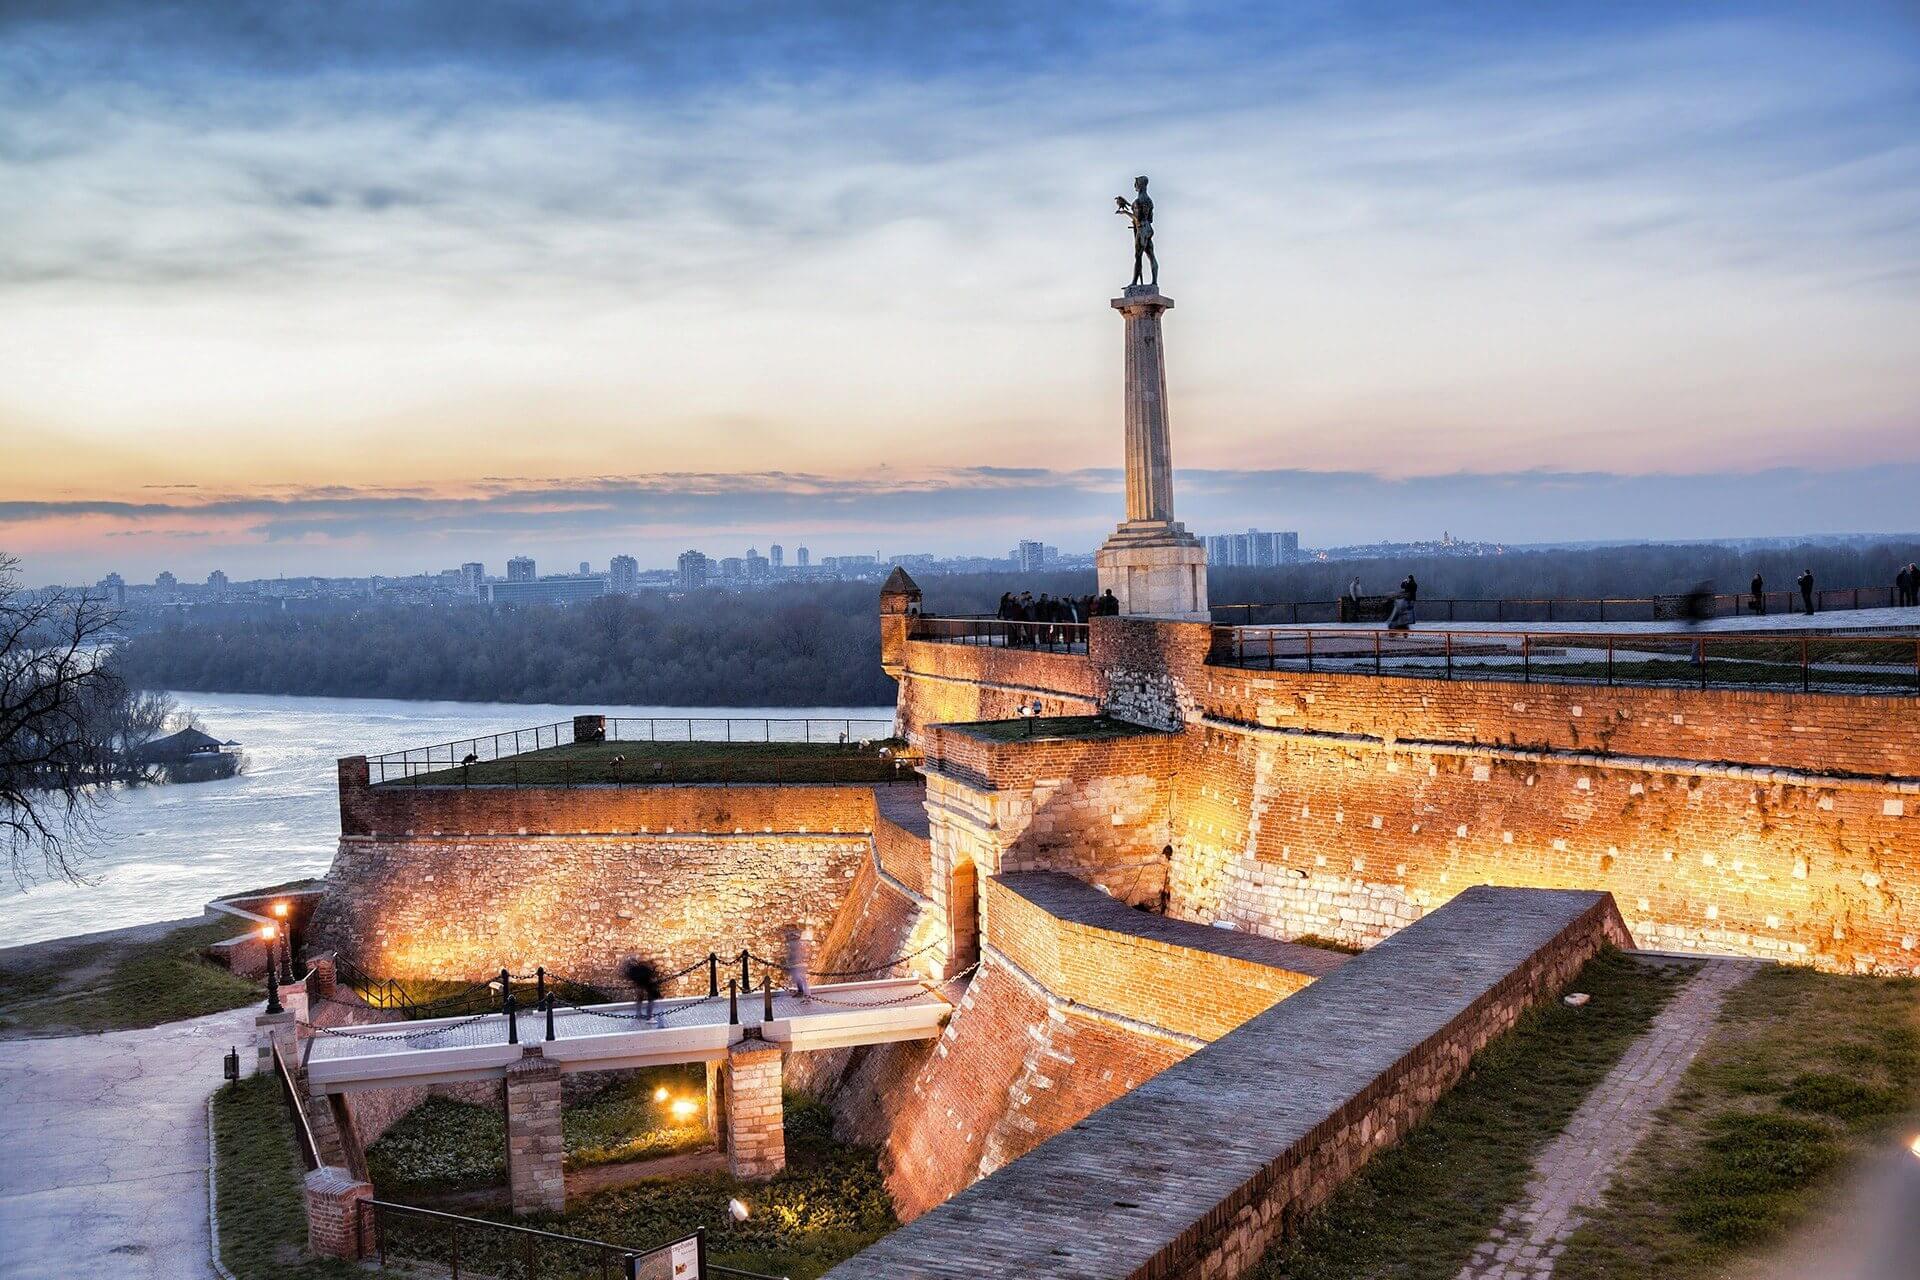 belgrad_fortress_1.jpg